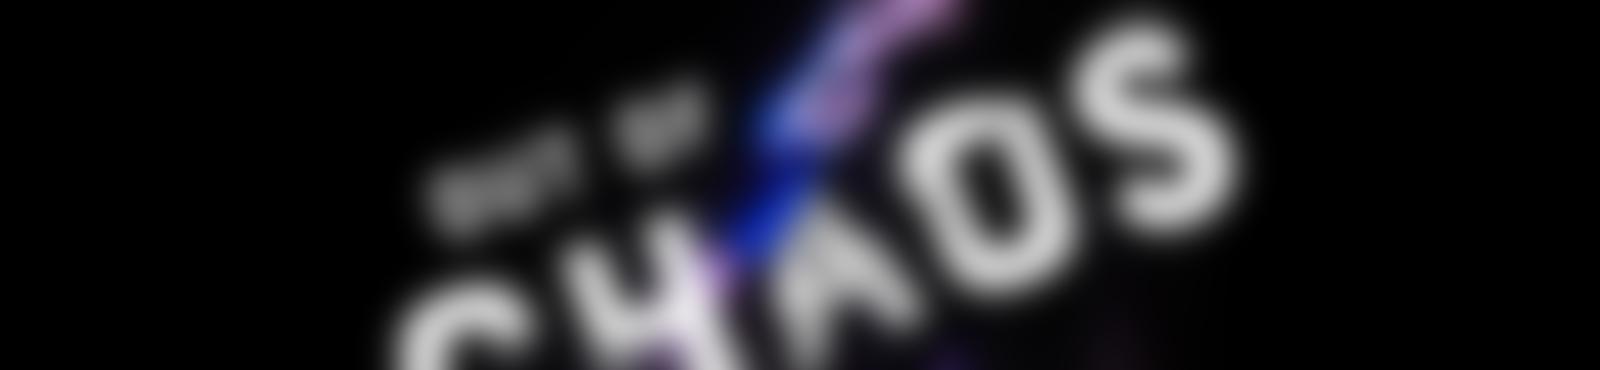 Blurred 455fc737 e24b 45ba b809 045eeaf36d7f